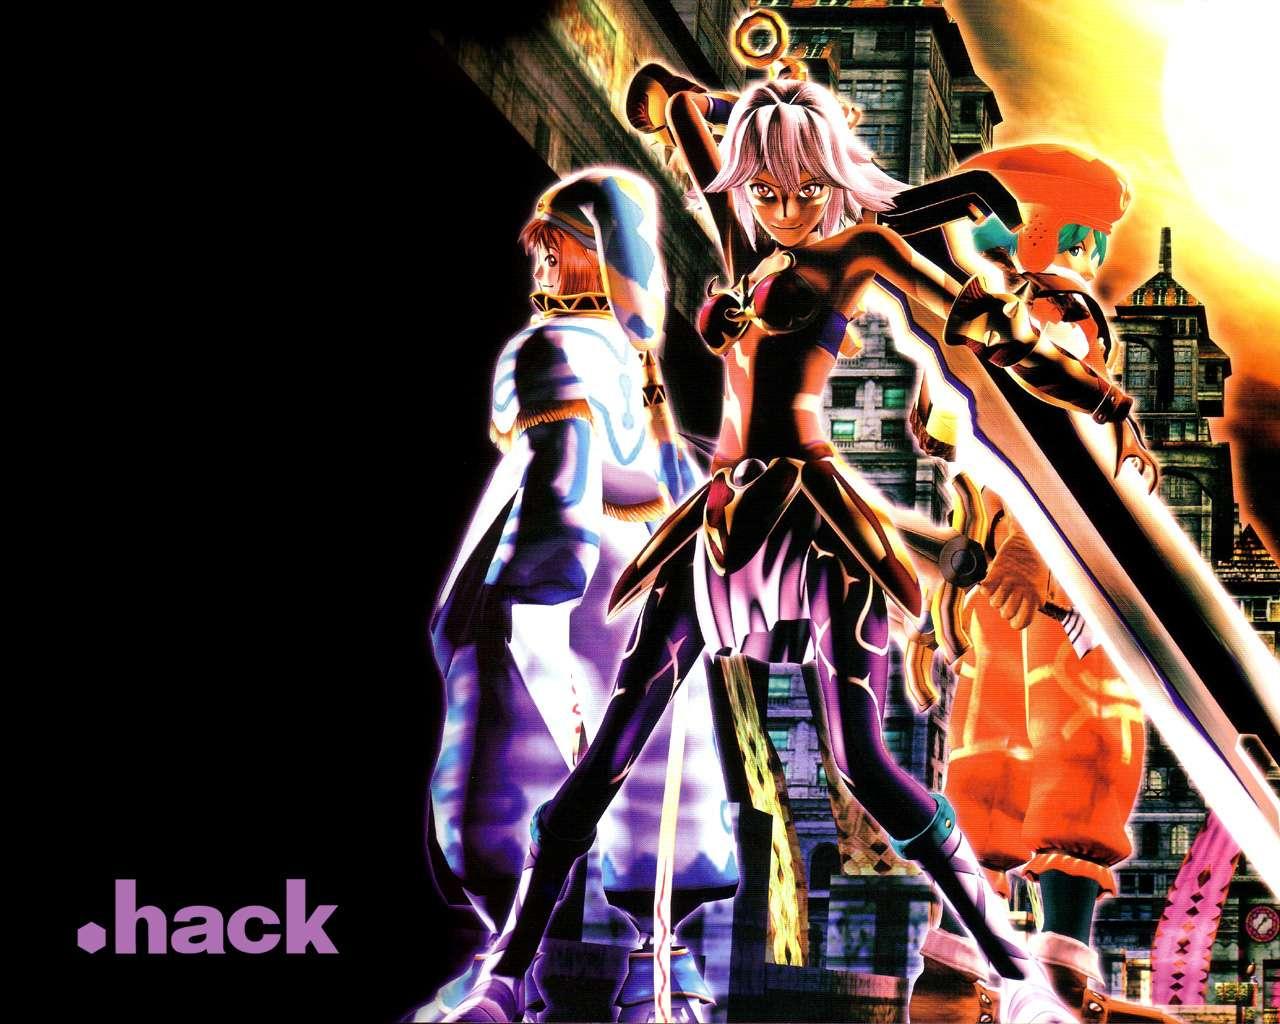 http://blog-imgs-45.fc2.com/a/n/k/ankosokuho/hack_46.jpg